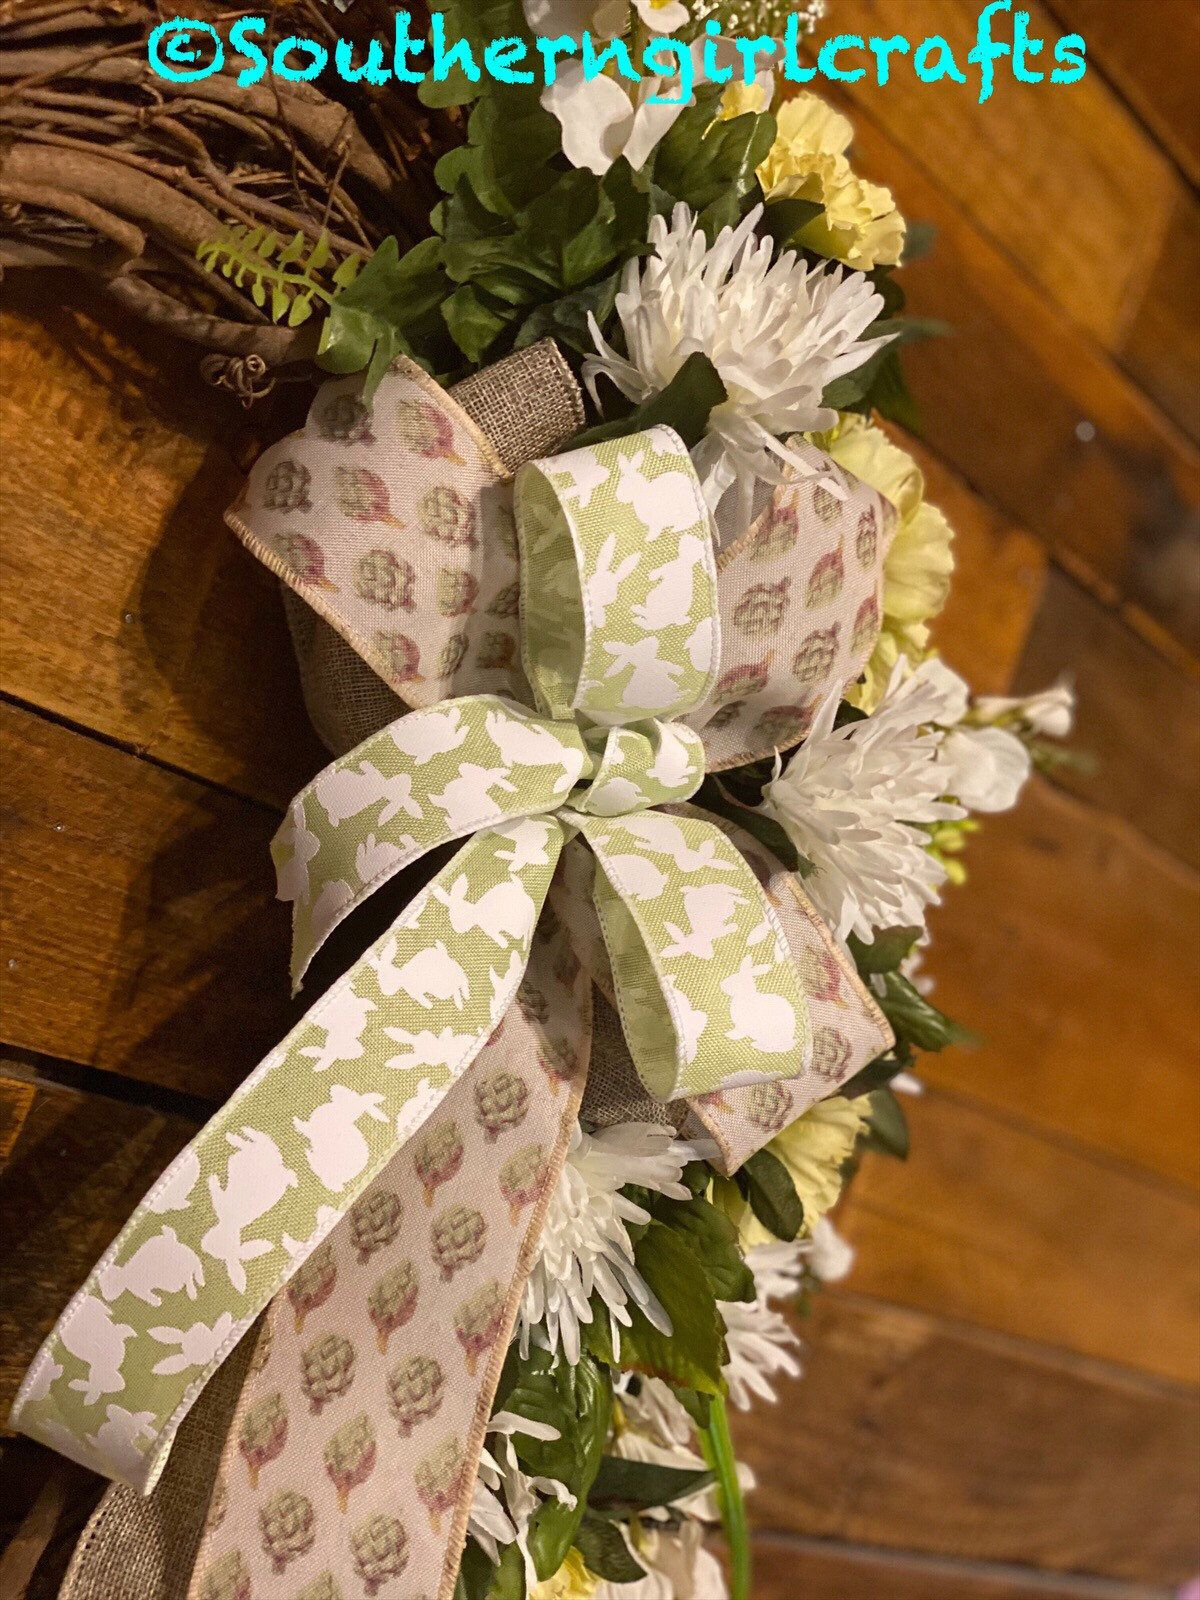 Photo of Easter grapevine wreath, farmhouse decor, front door decor, simple elegance